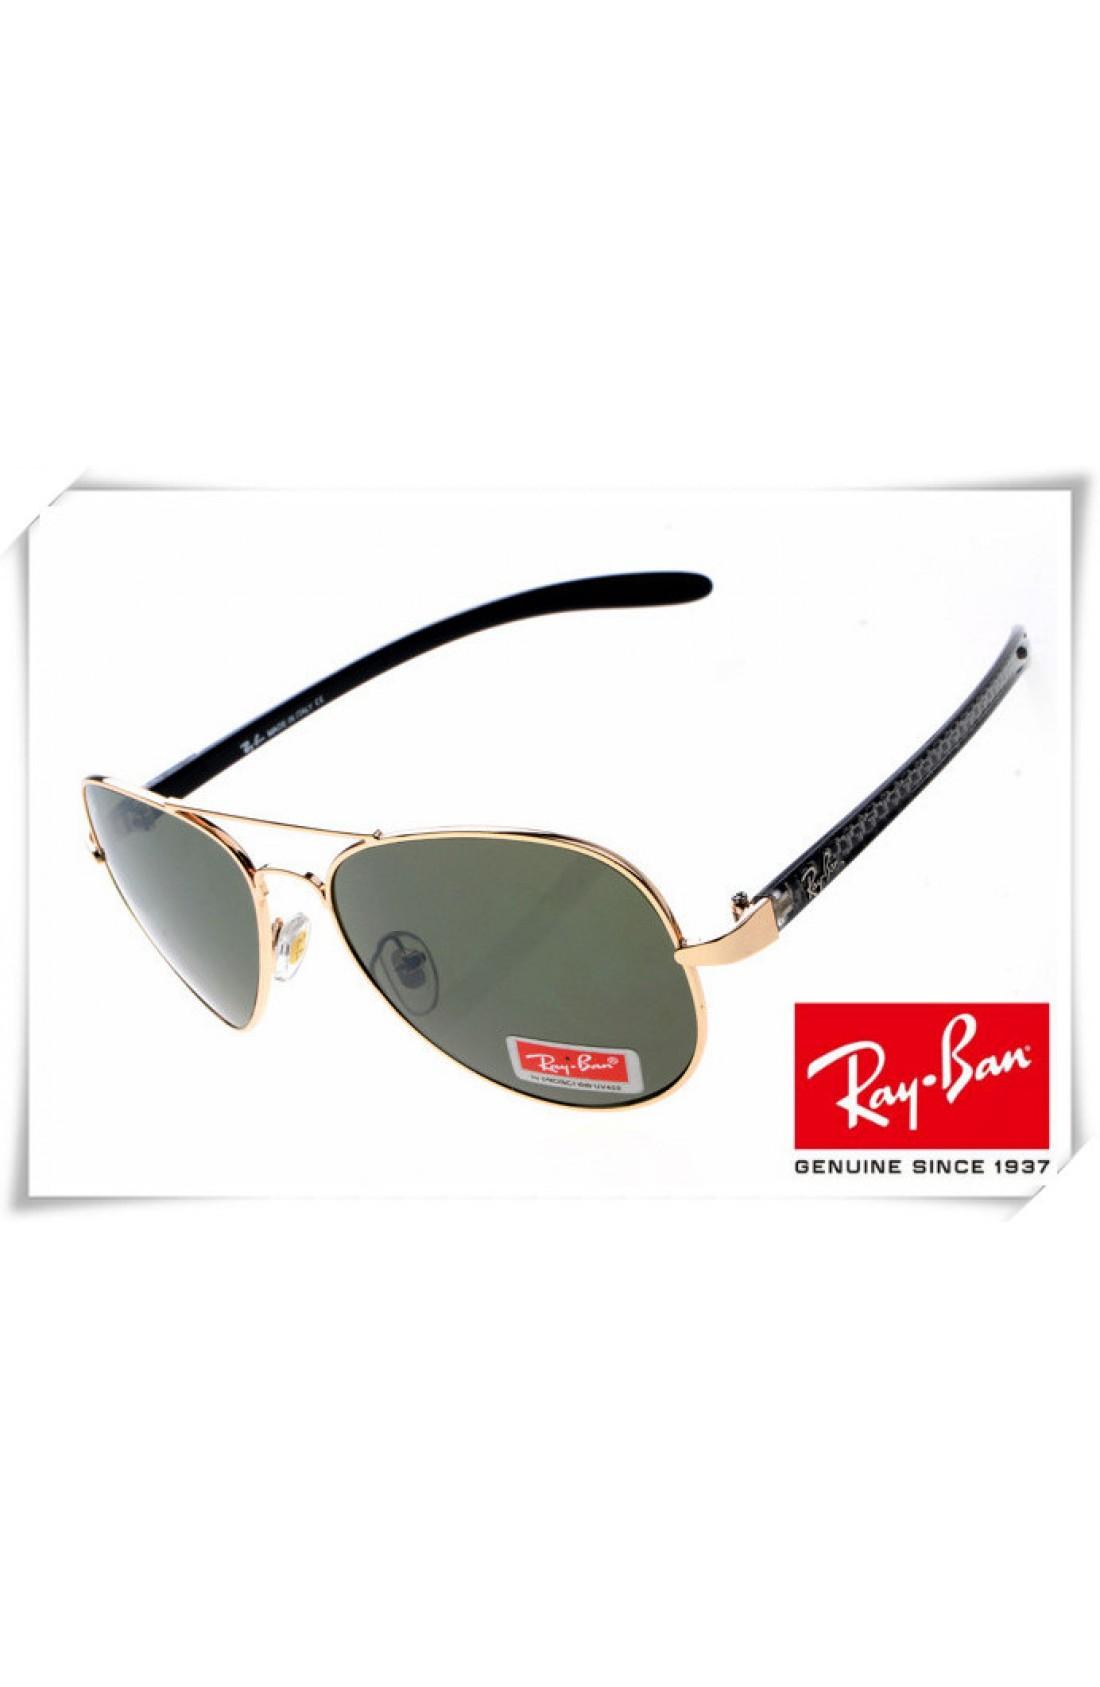 d316f2582 Fake Ray Ban RB8307 Aviator Tech Sunglasses Carbon Fibre Gold Black ...